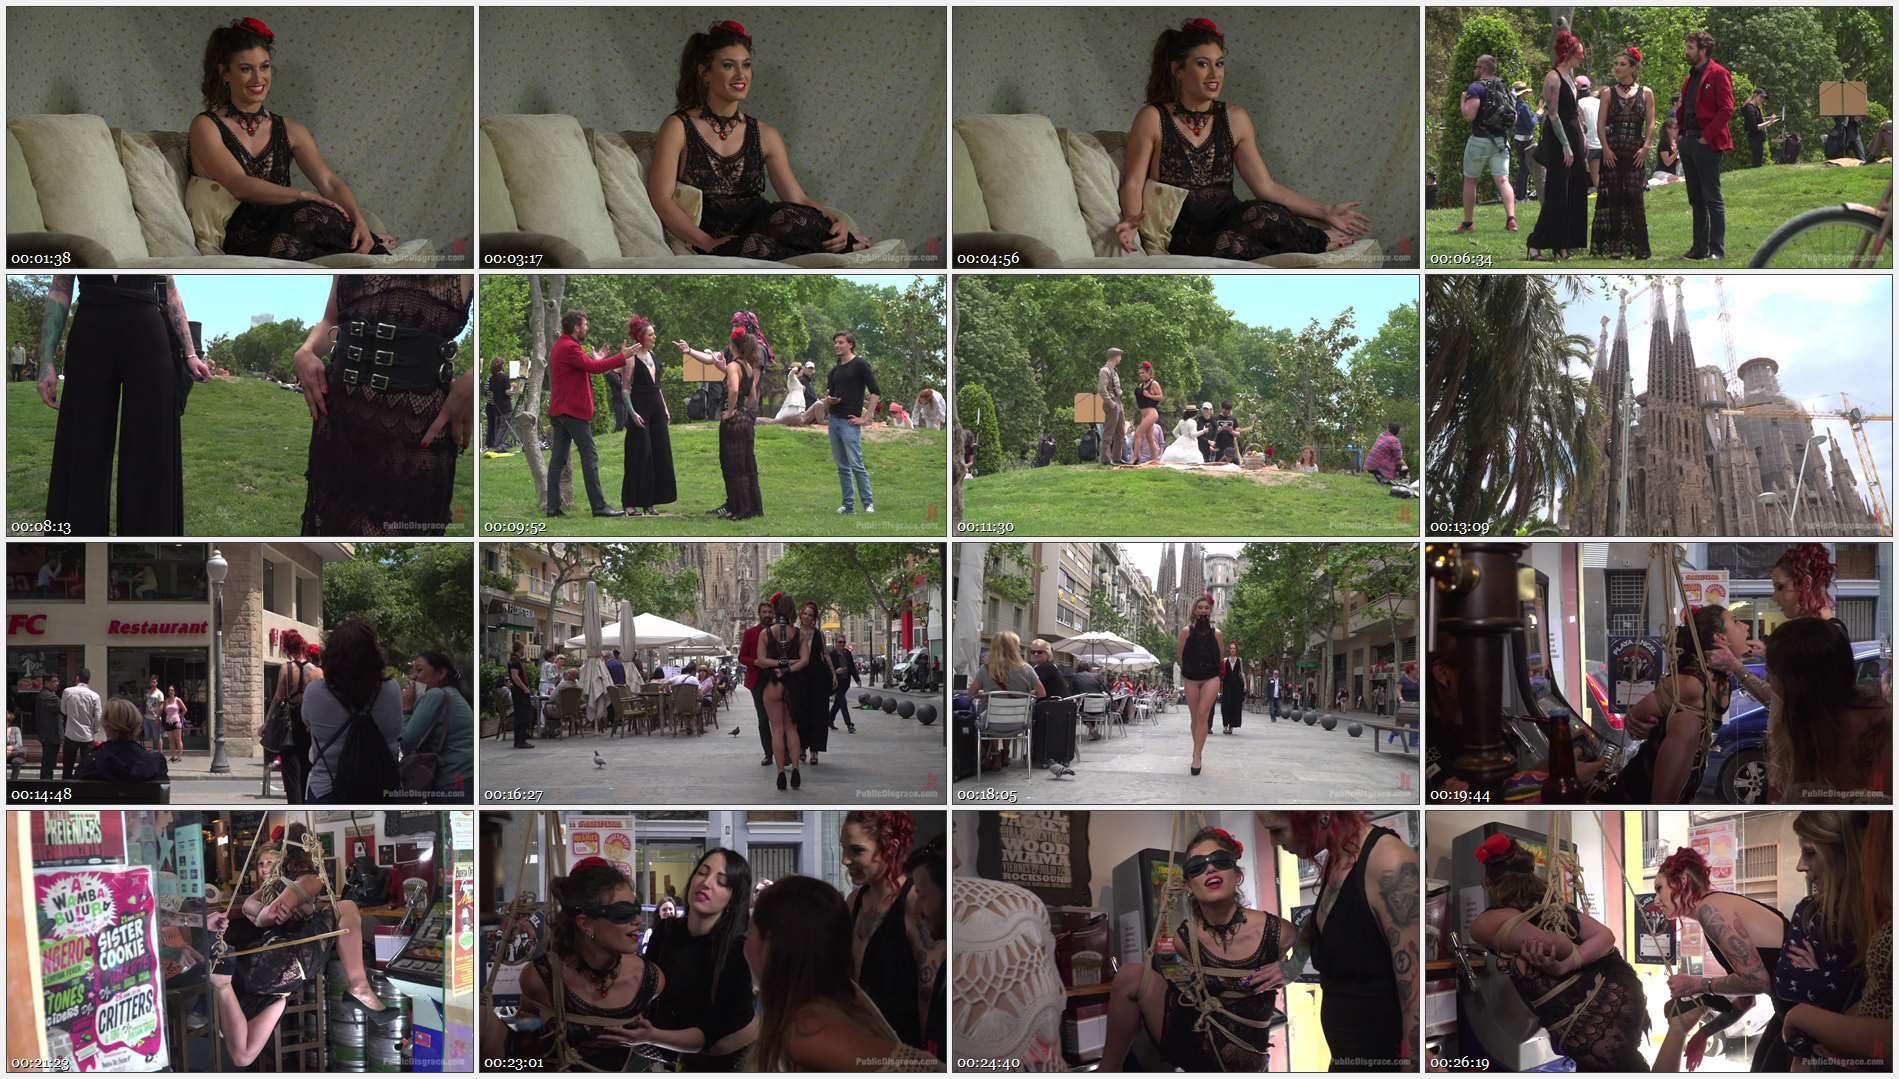 Steve Holmes – Silvia Rubi – Pablo Ferrari – Julia Roca – Shy Pretty Bitch Sings in Pain – Part 1